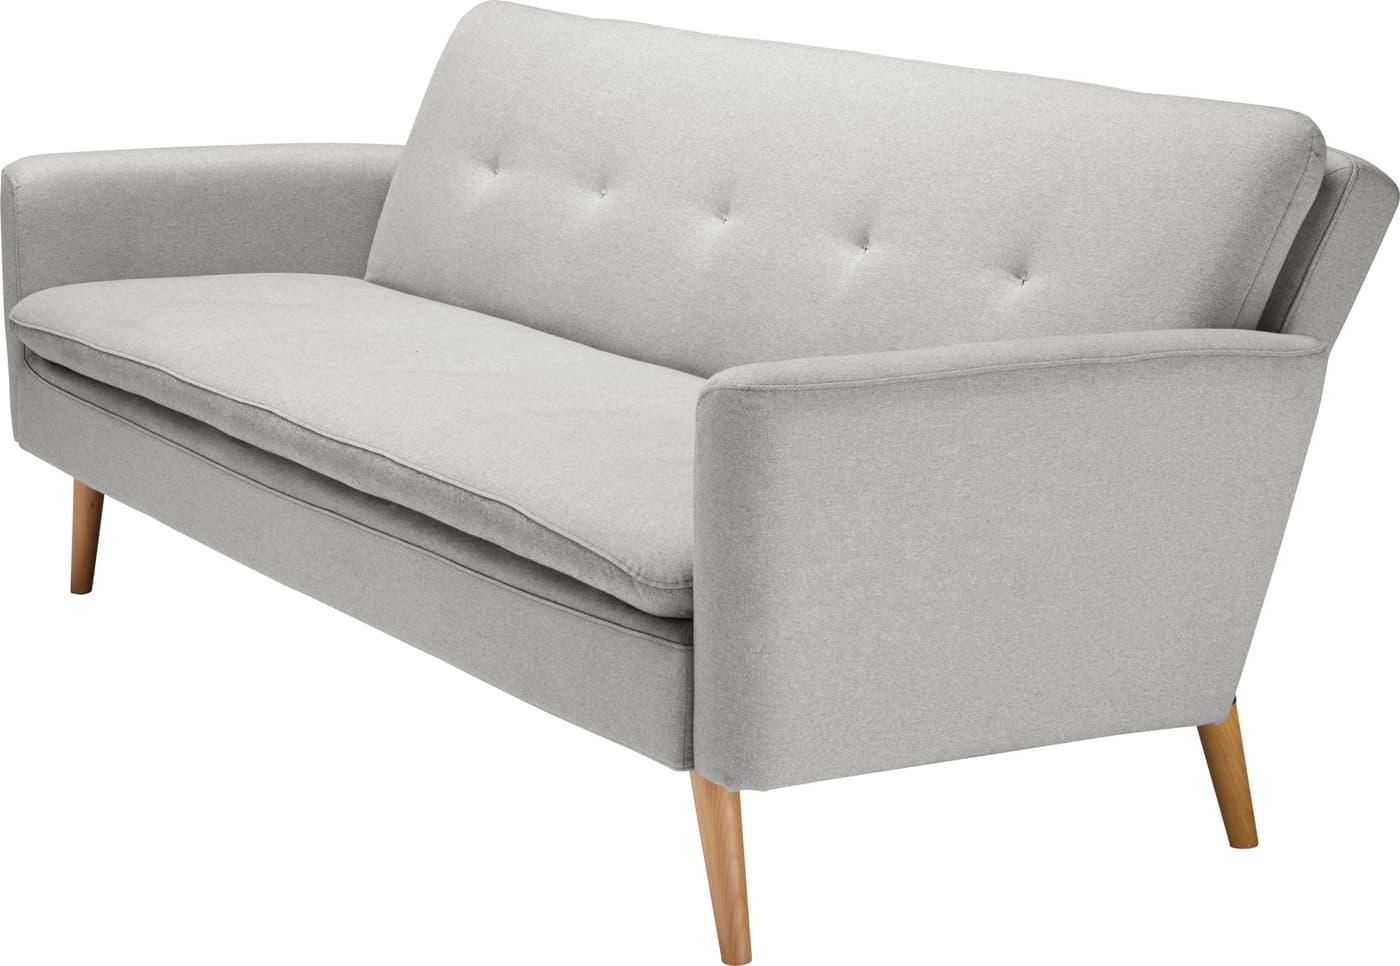 gilli bettsofa migros. Black Bedroom Furniture Sets. Home Design Ideas